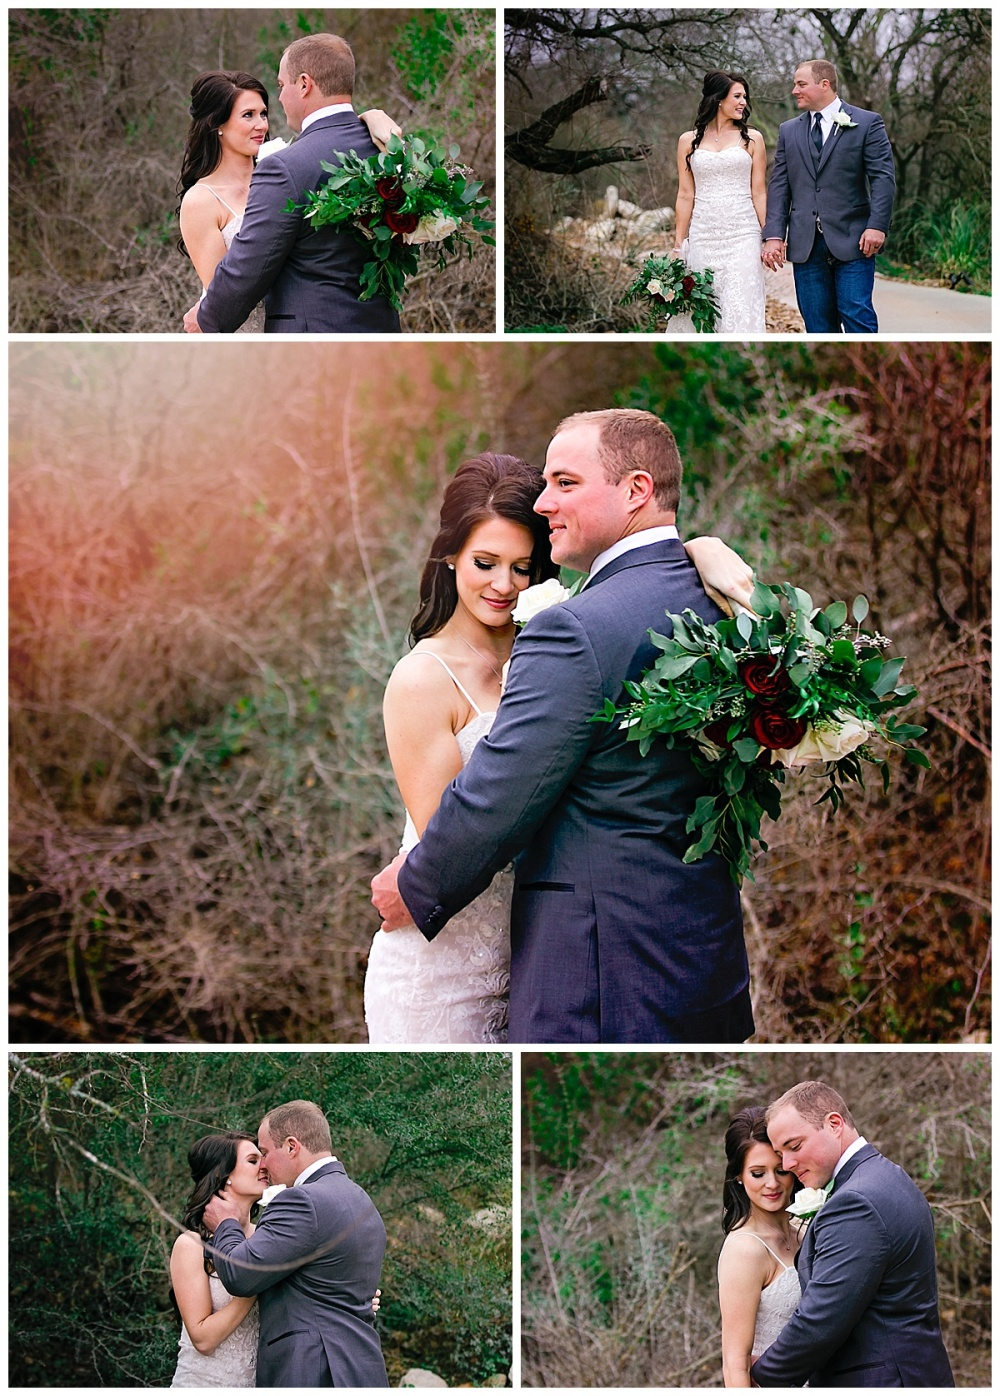 Carly-Barton-Photography-Geronimo-Oaks-Wedding-Venue-Texas-Hill-Country-Ronnie-Sarah_0073.jpg